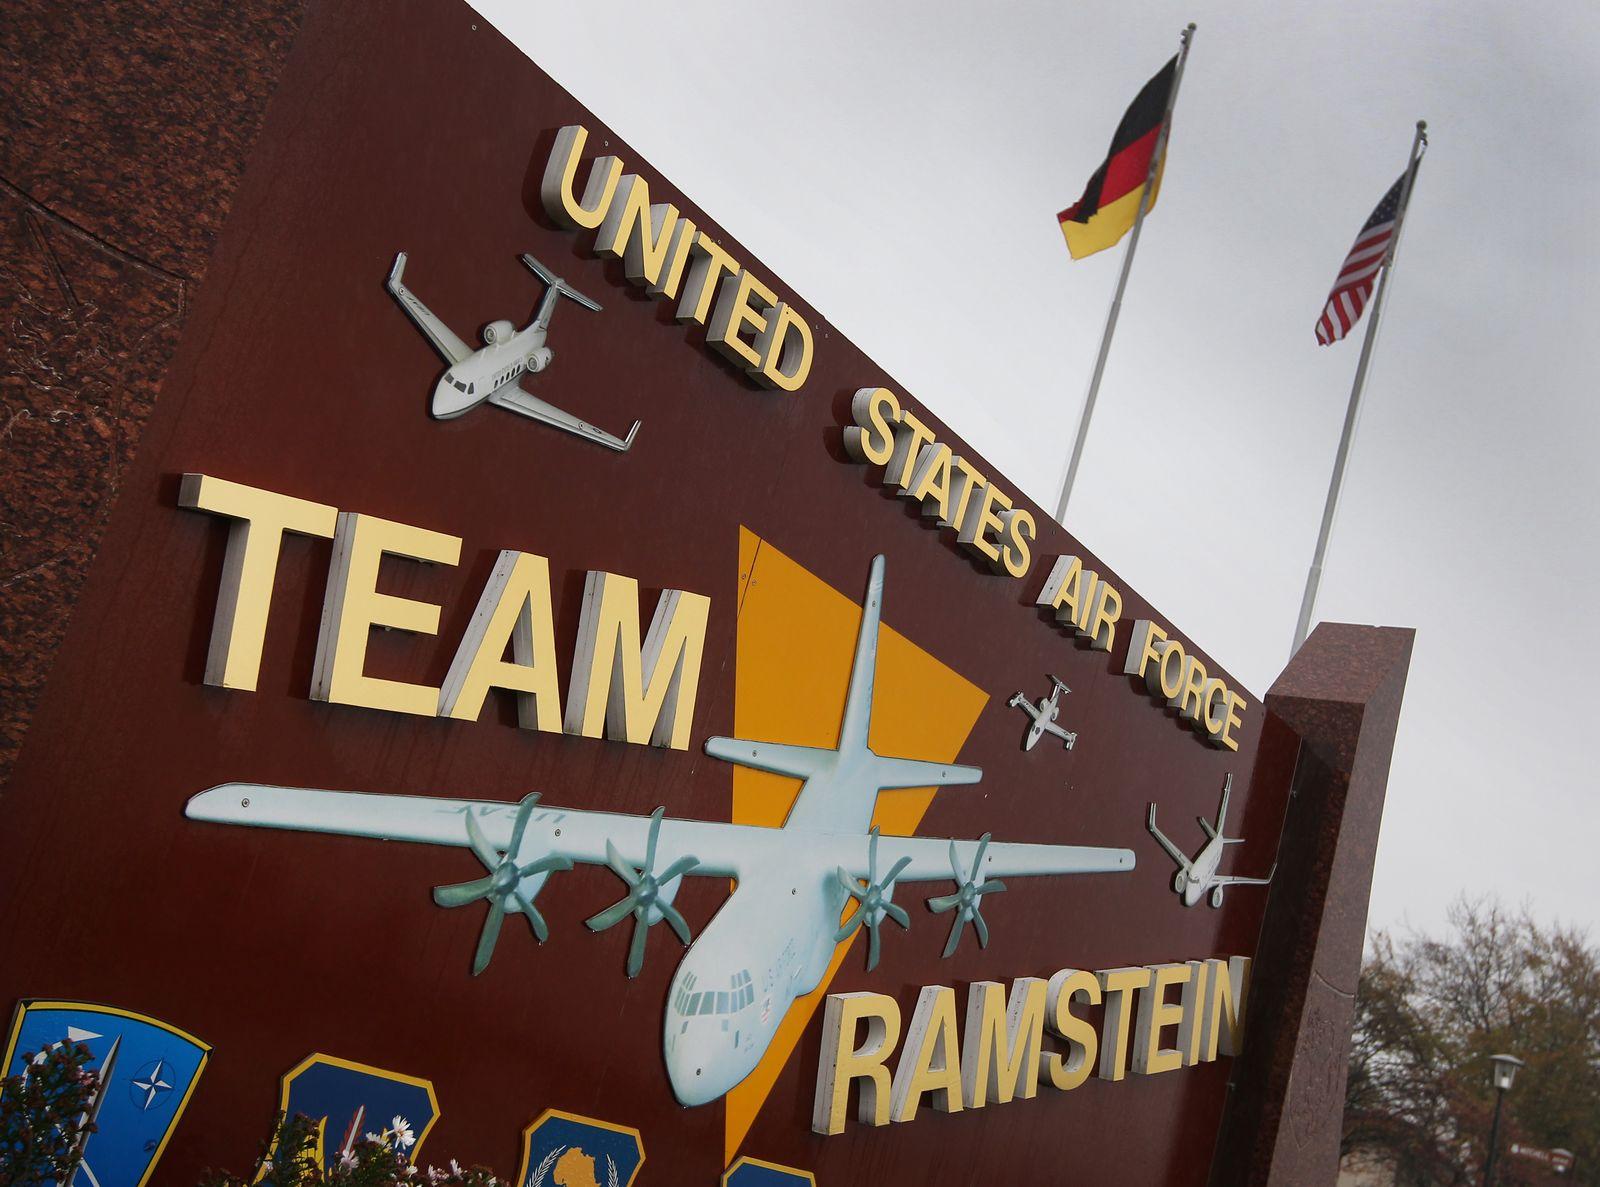 GERMANY-US-RAMSTEIN-ARMY